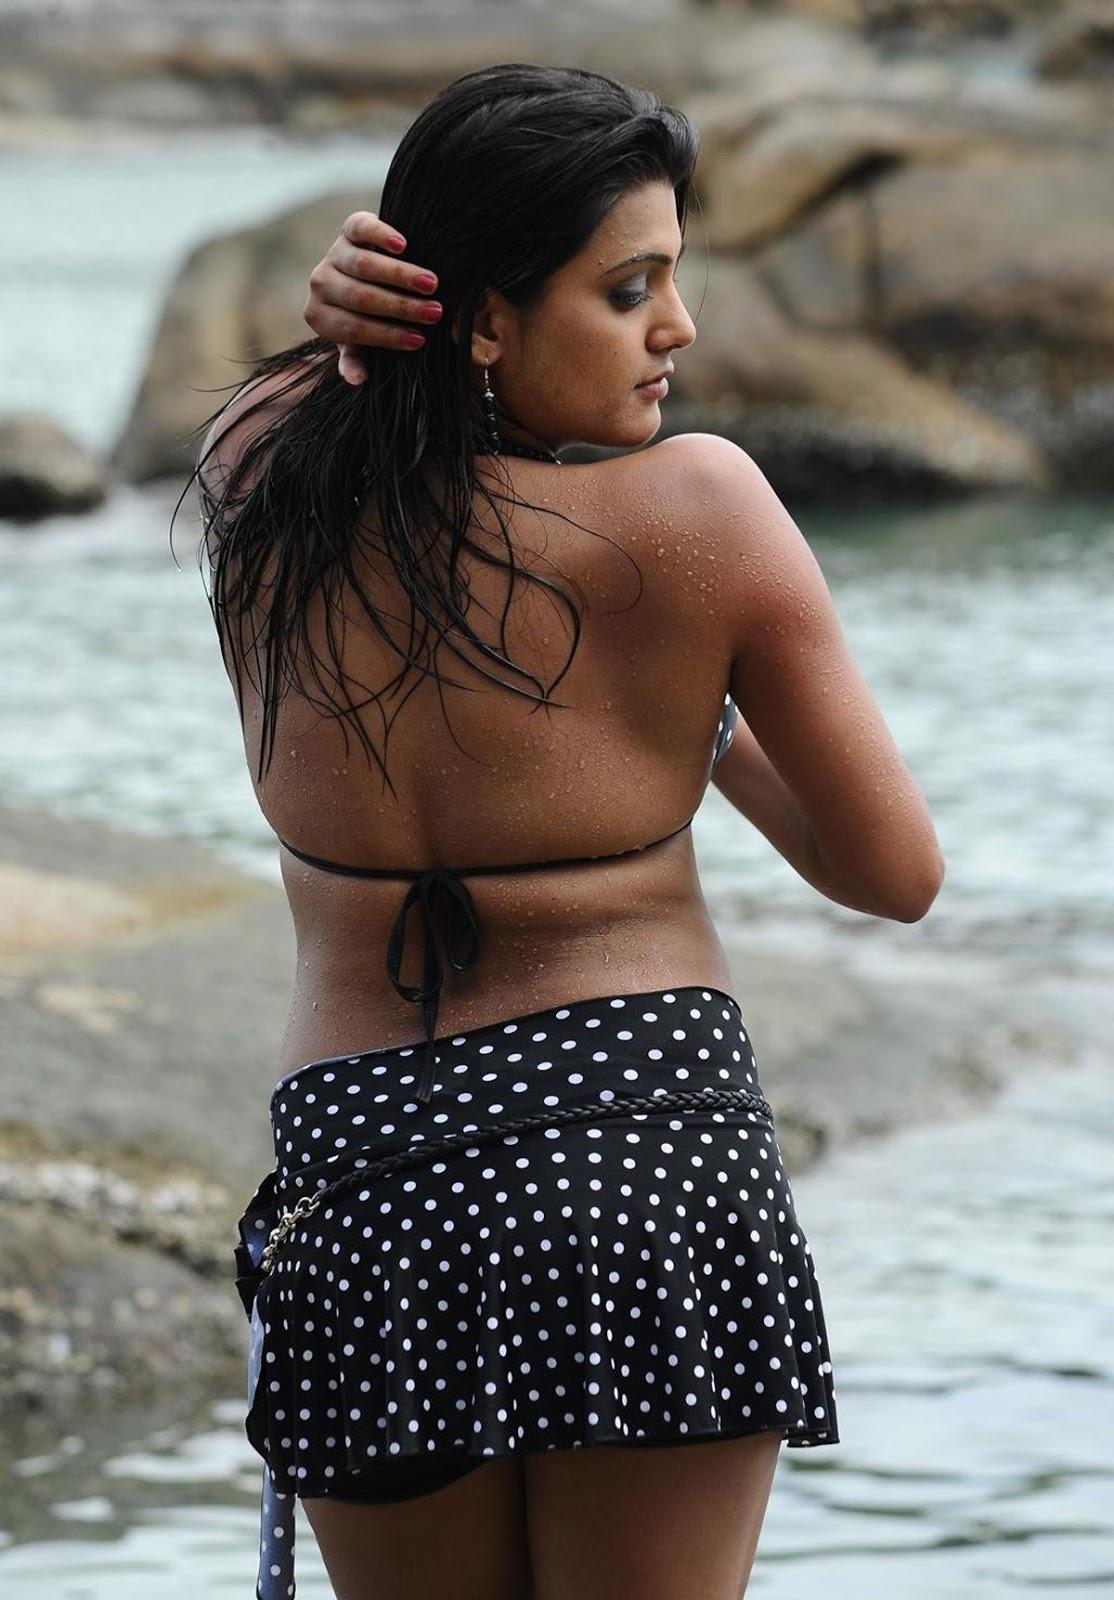 wet winning tashu kaushik latest hot spicy photos stills in beach